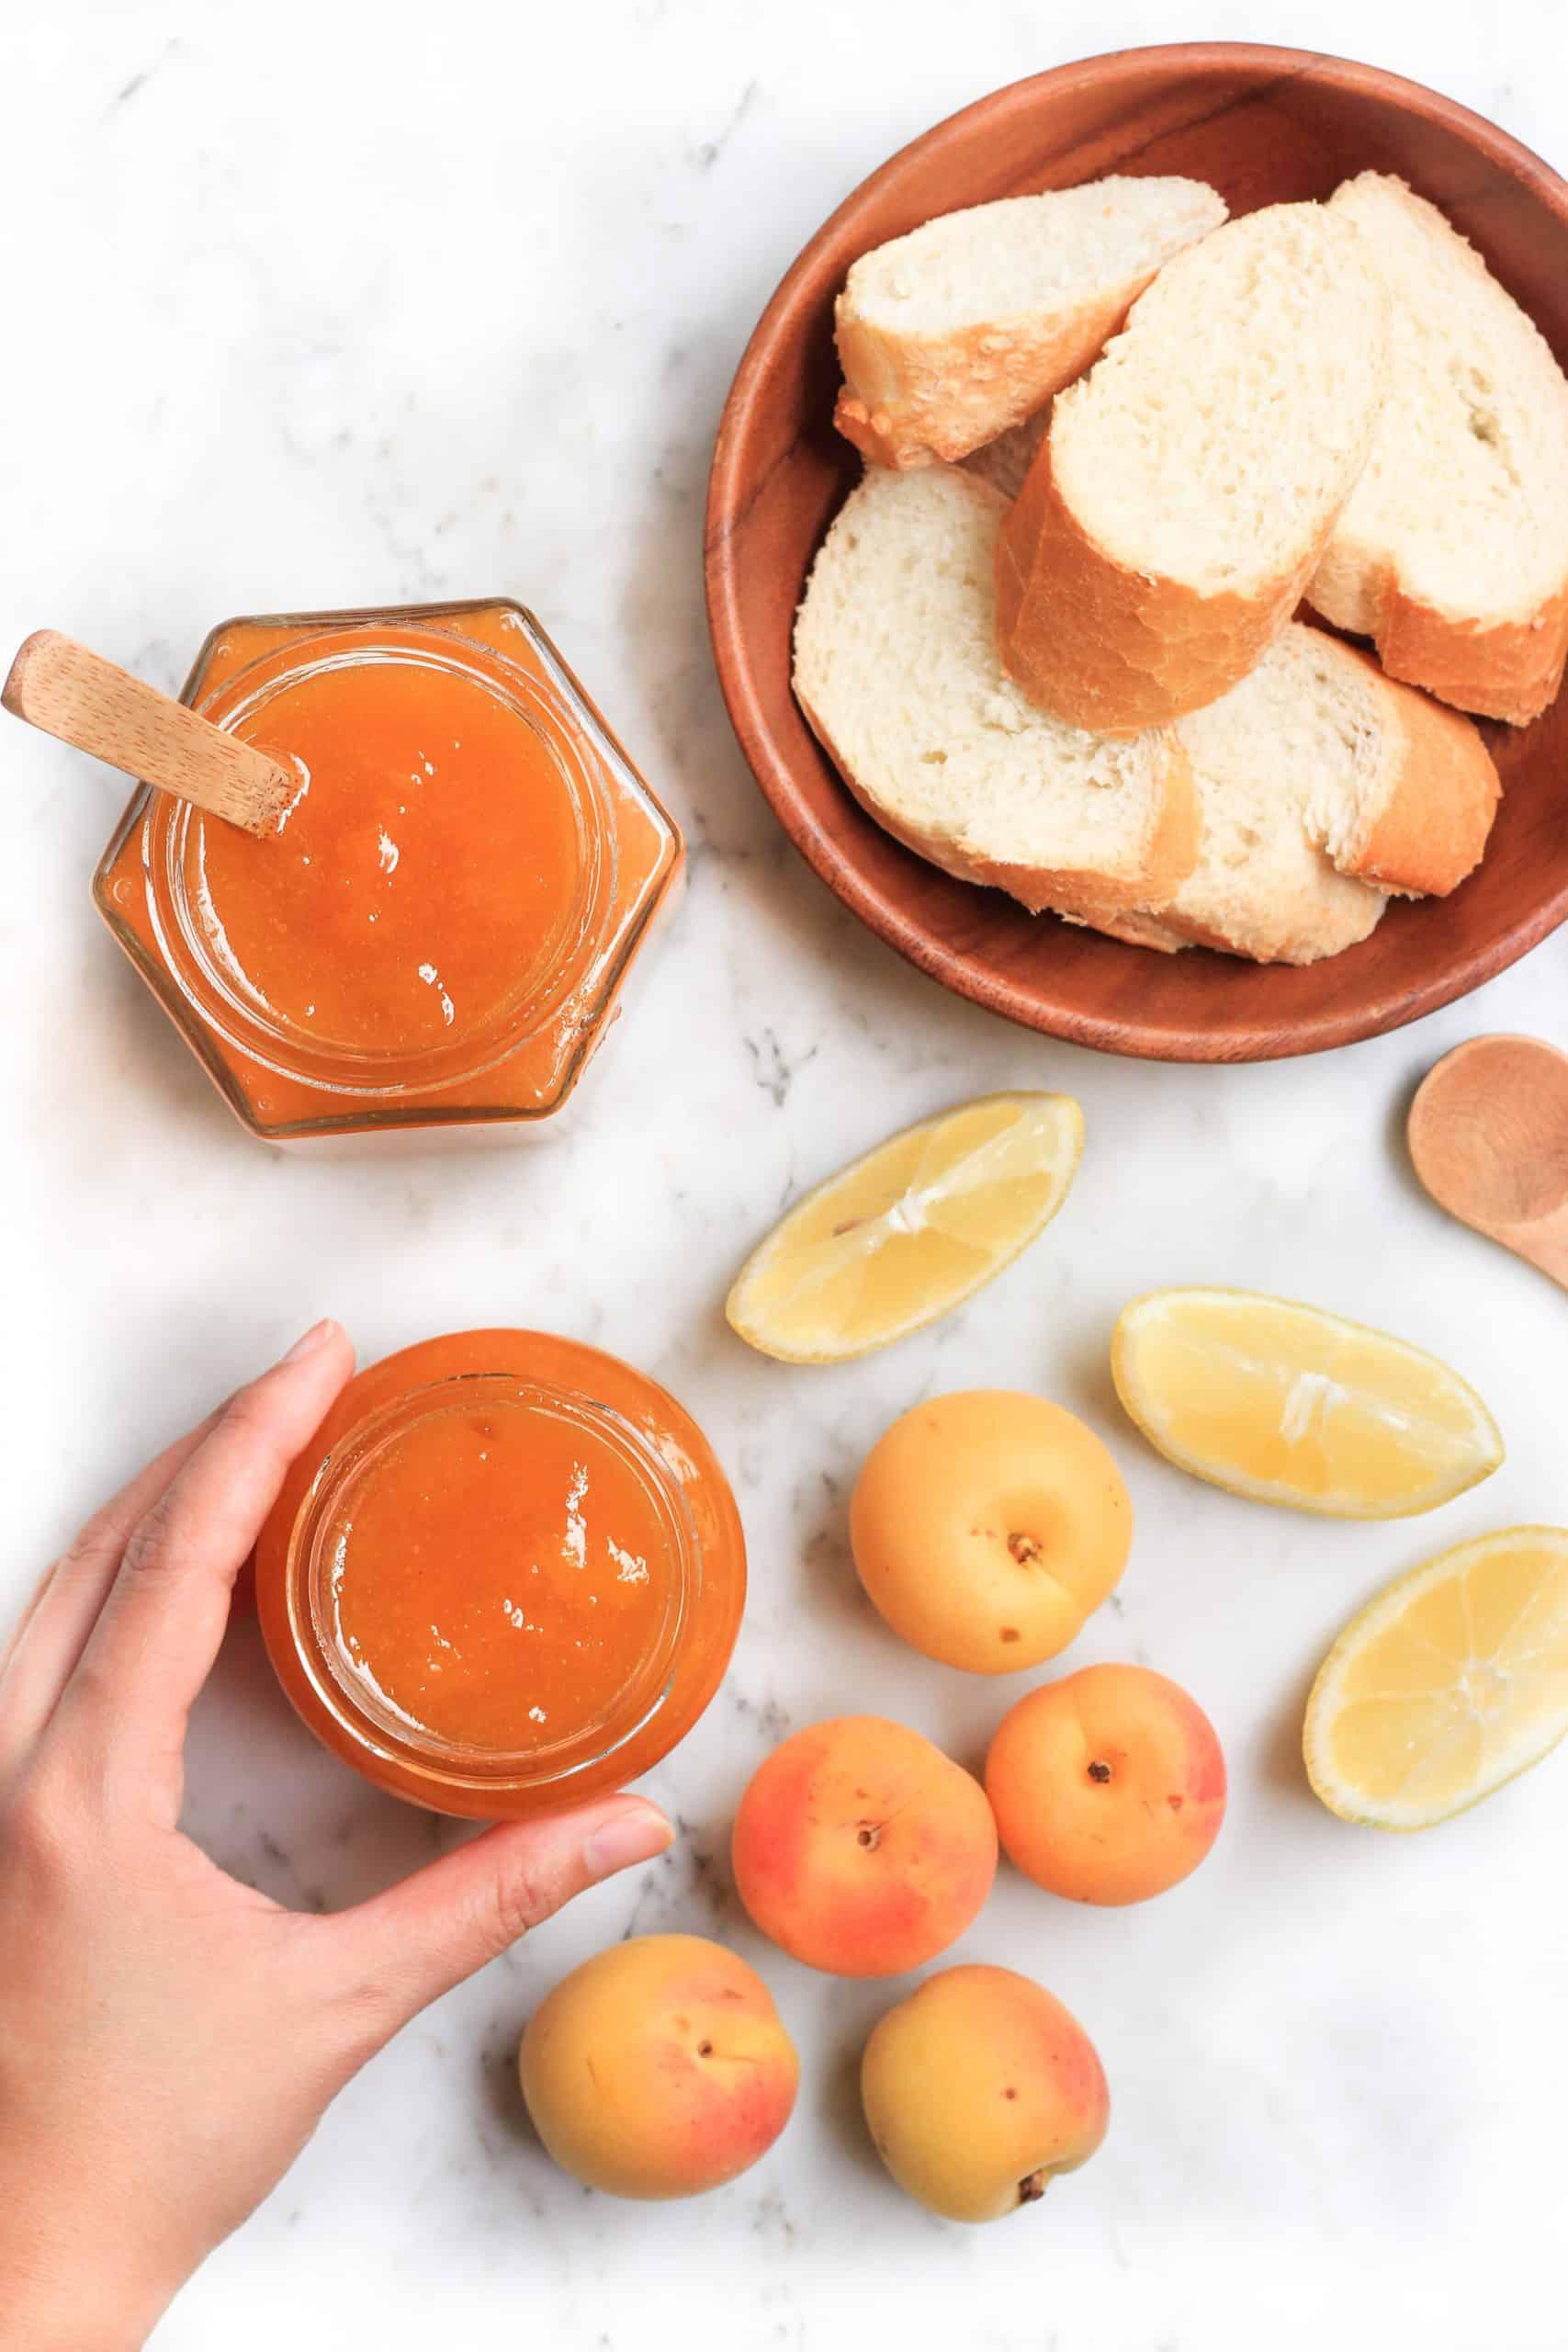 Hand reaching for fresh apricot jam.